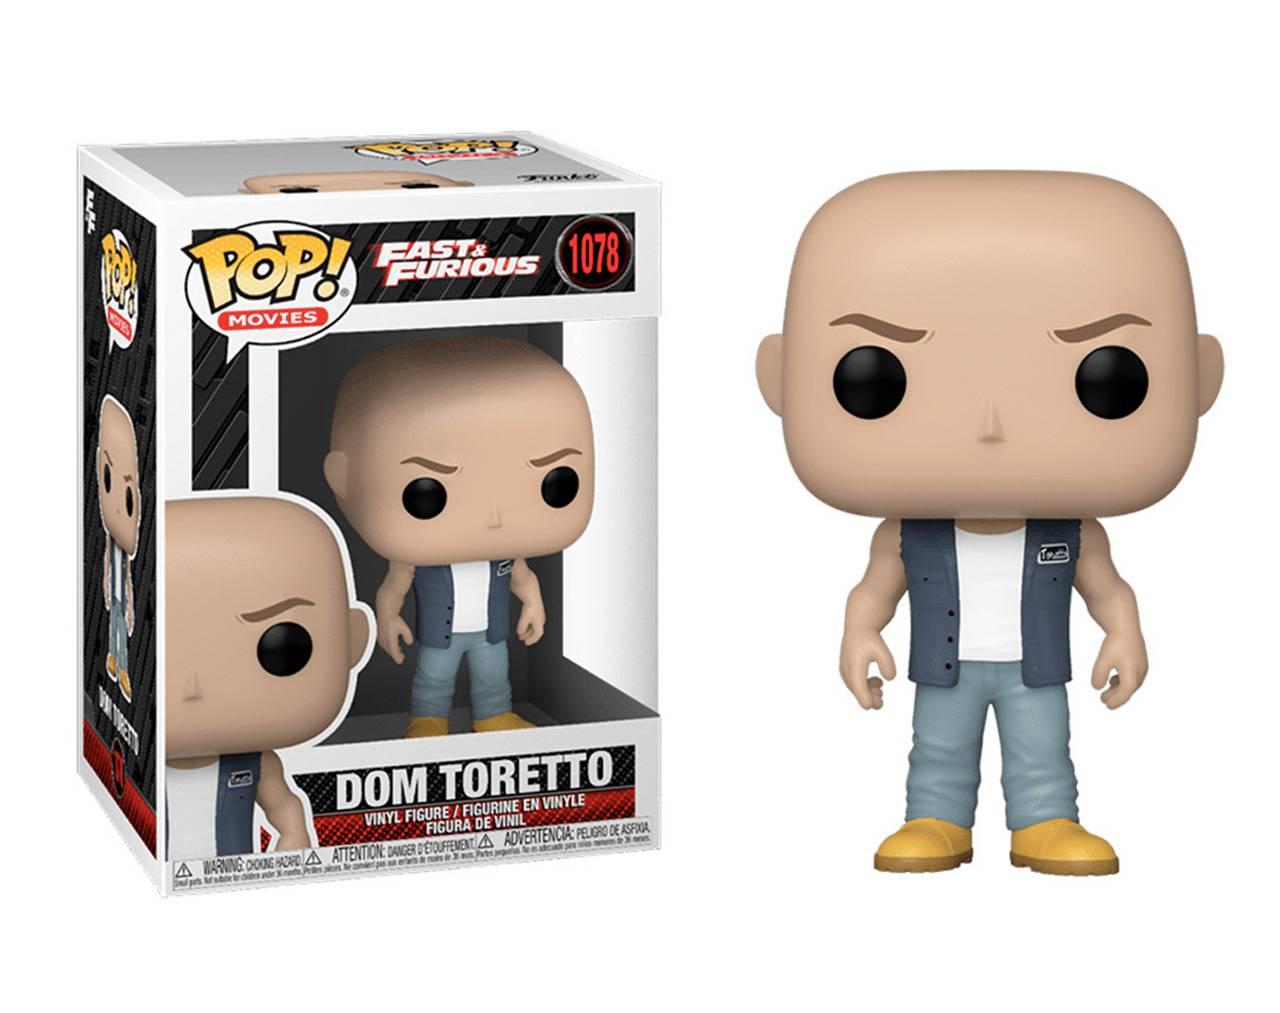 Dom Toretto Pop! Vinyl